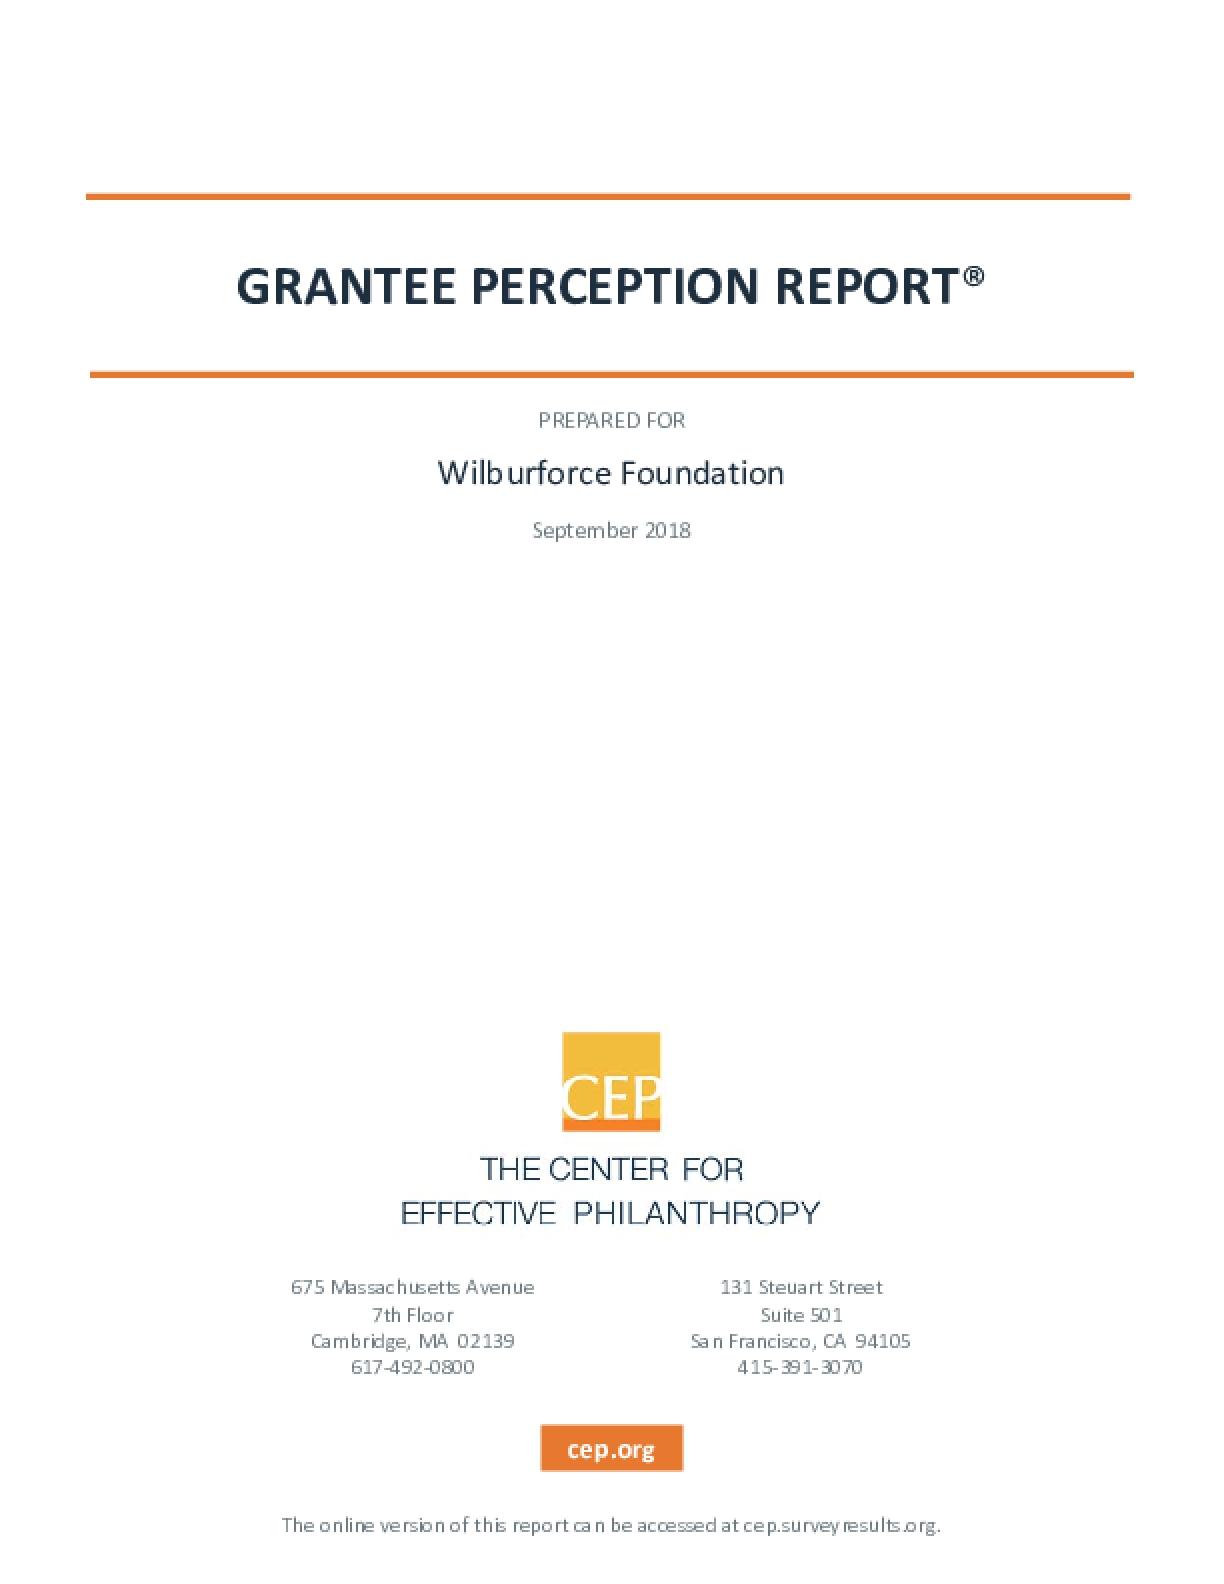 2018 Grantee Perception Report: Wilburforce Foundation